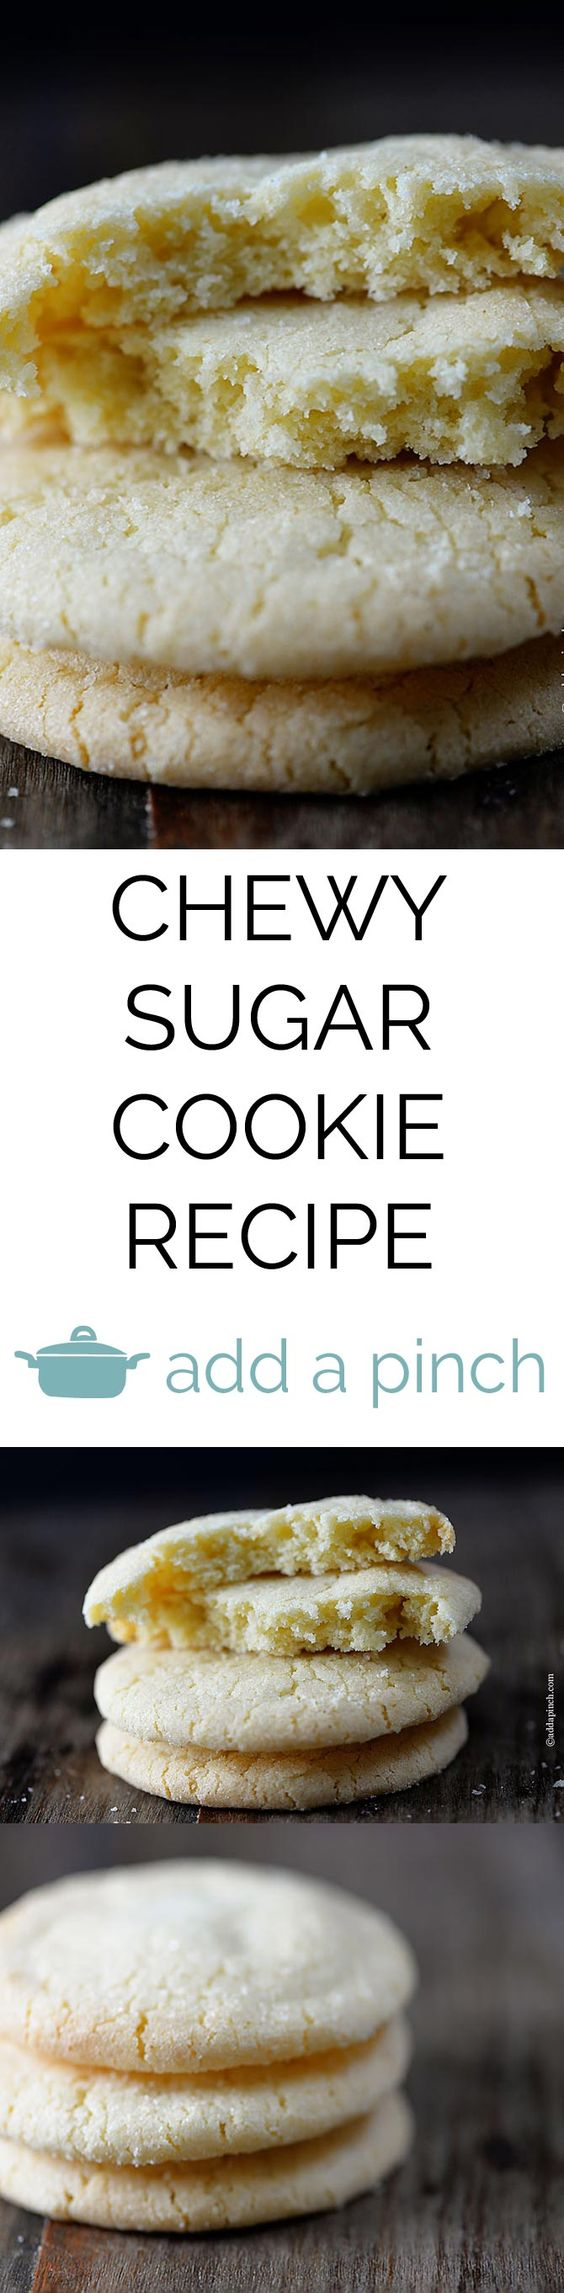 Sugar Cookie Recipe from addapinch.com